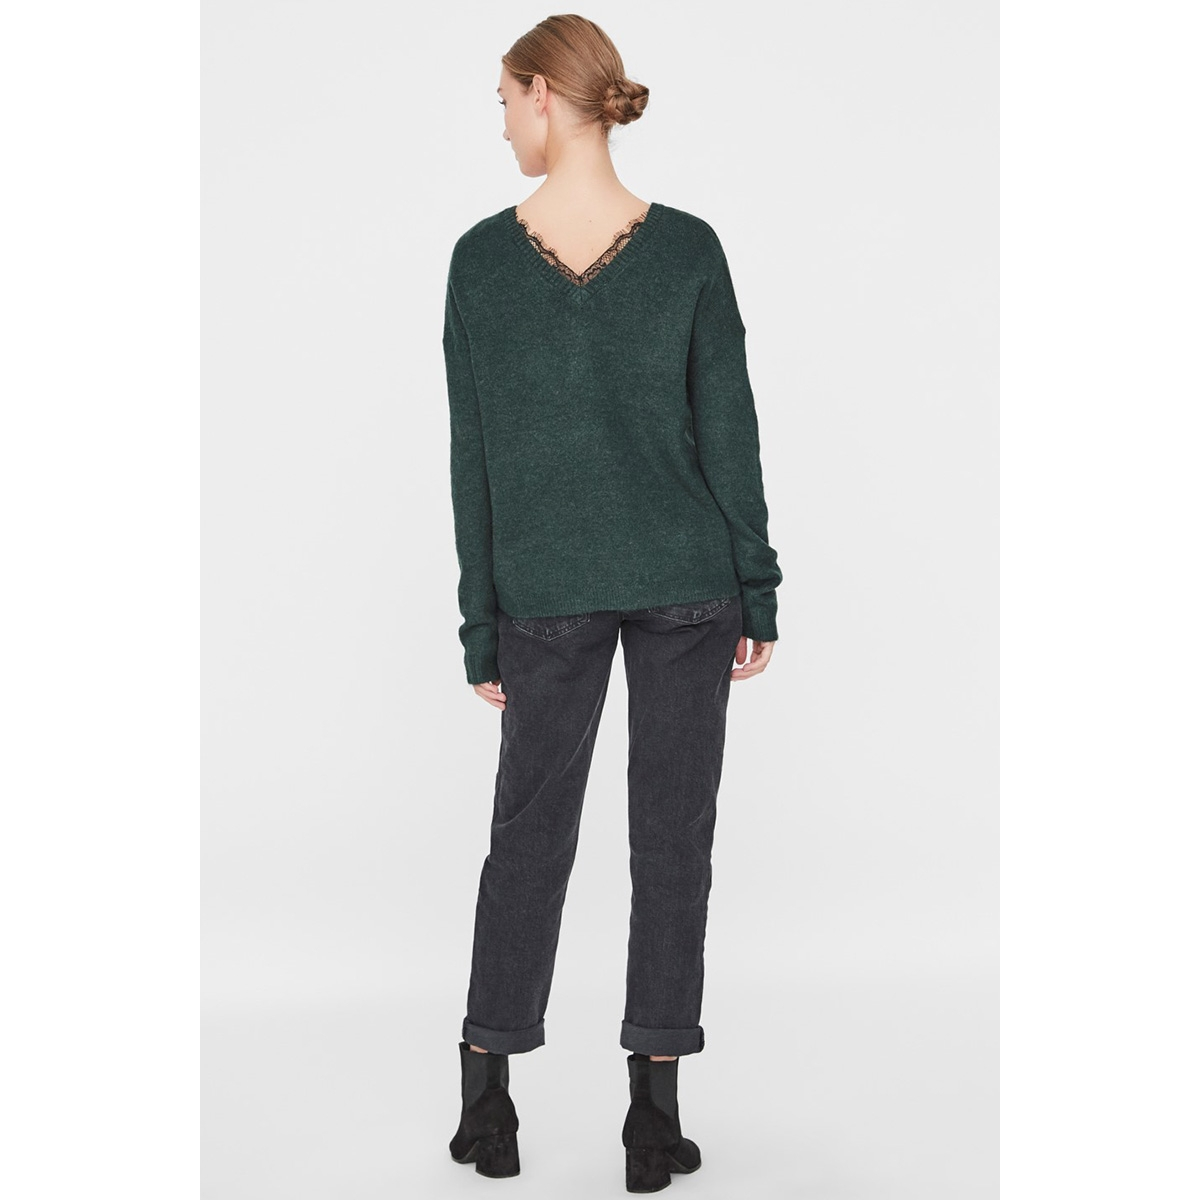 vmrana ls v-neck lace back blouse b 10217842 vero moda trui ponderosa pine/melange